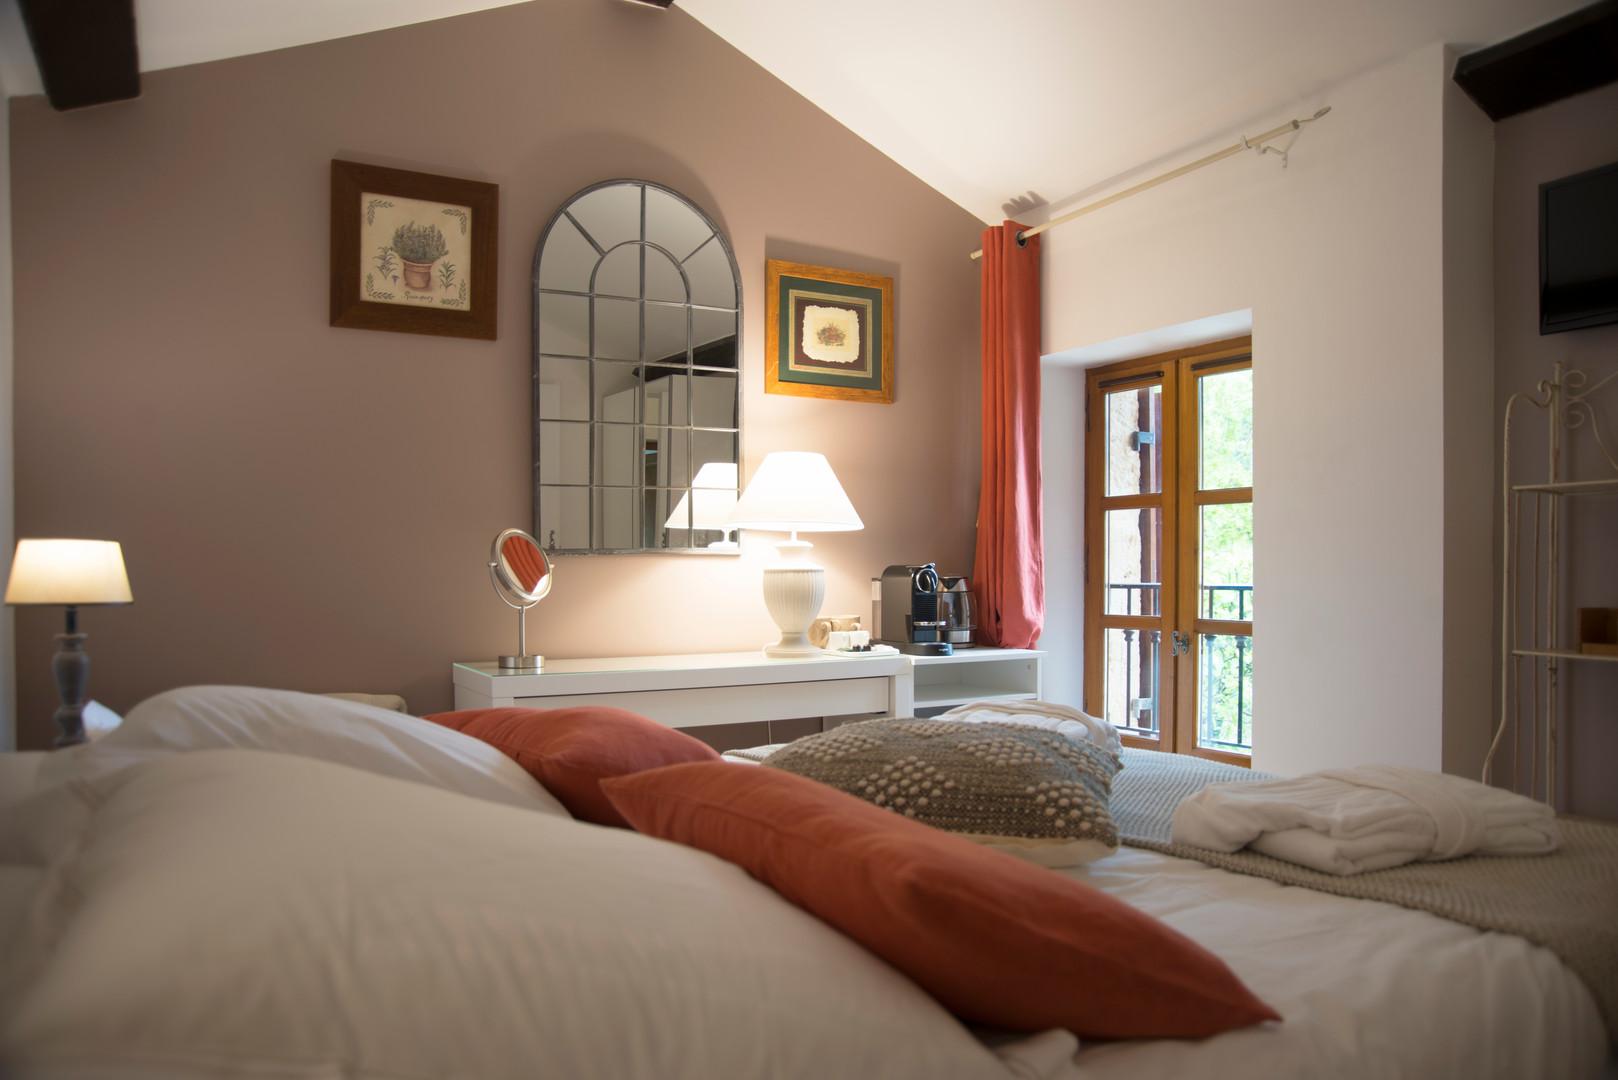 maison-hotes-de-charme-chambre-discrete-la-roque-gageac-sarlat.jpg